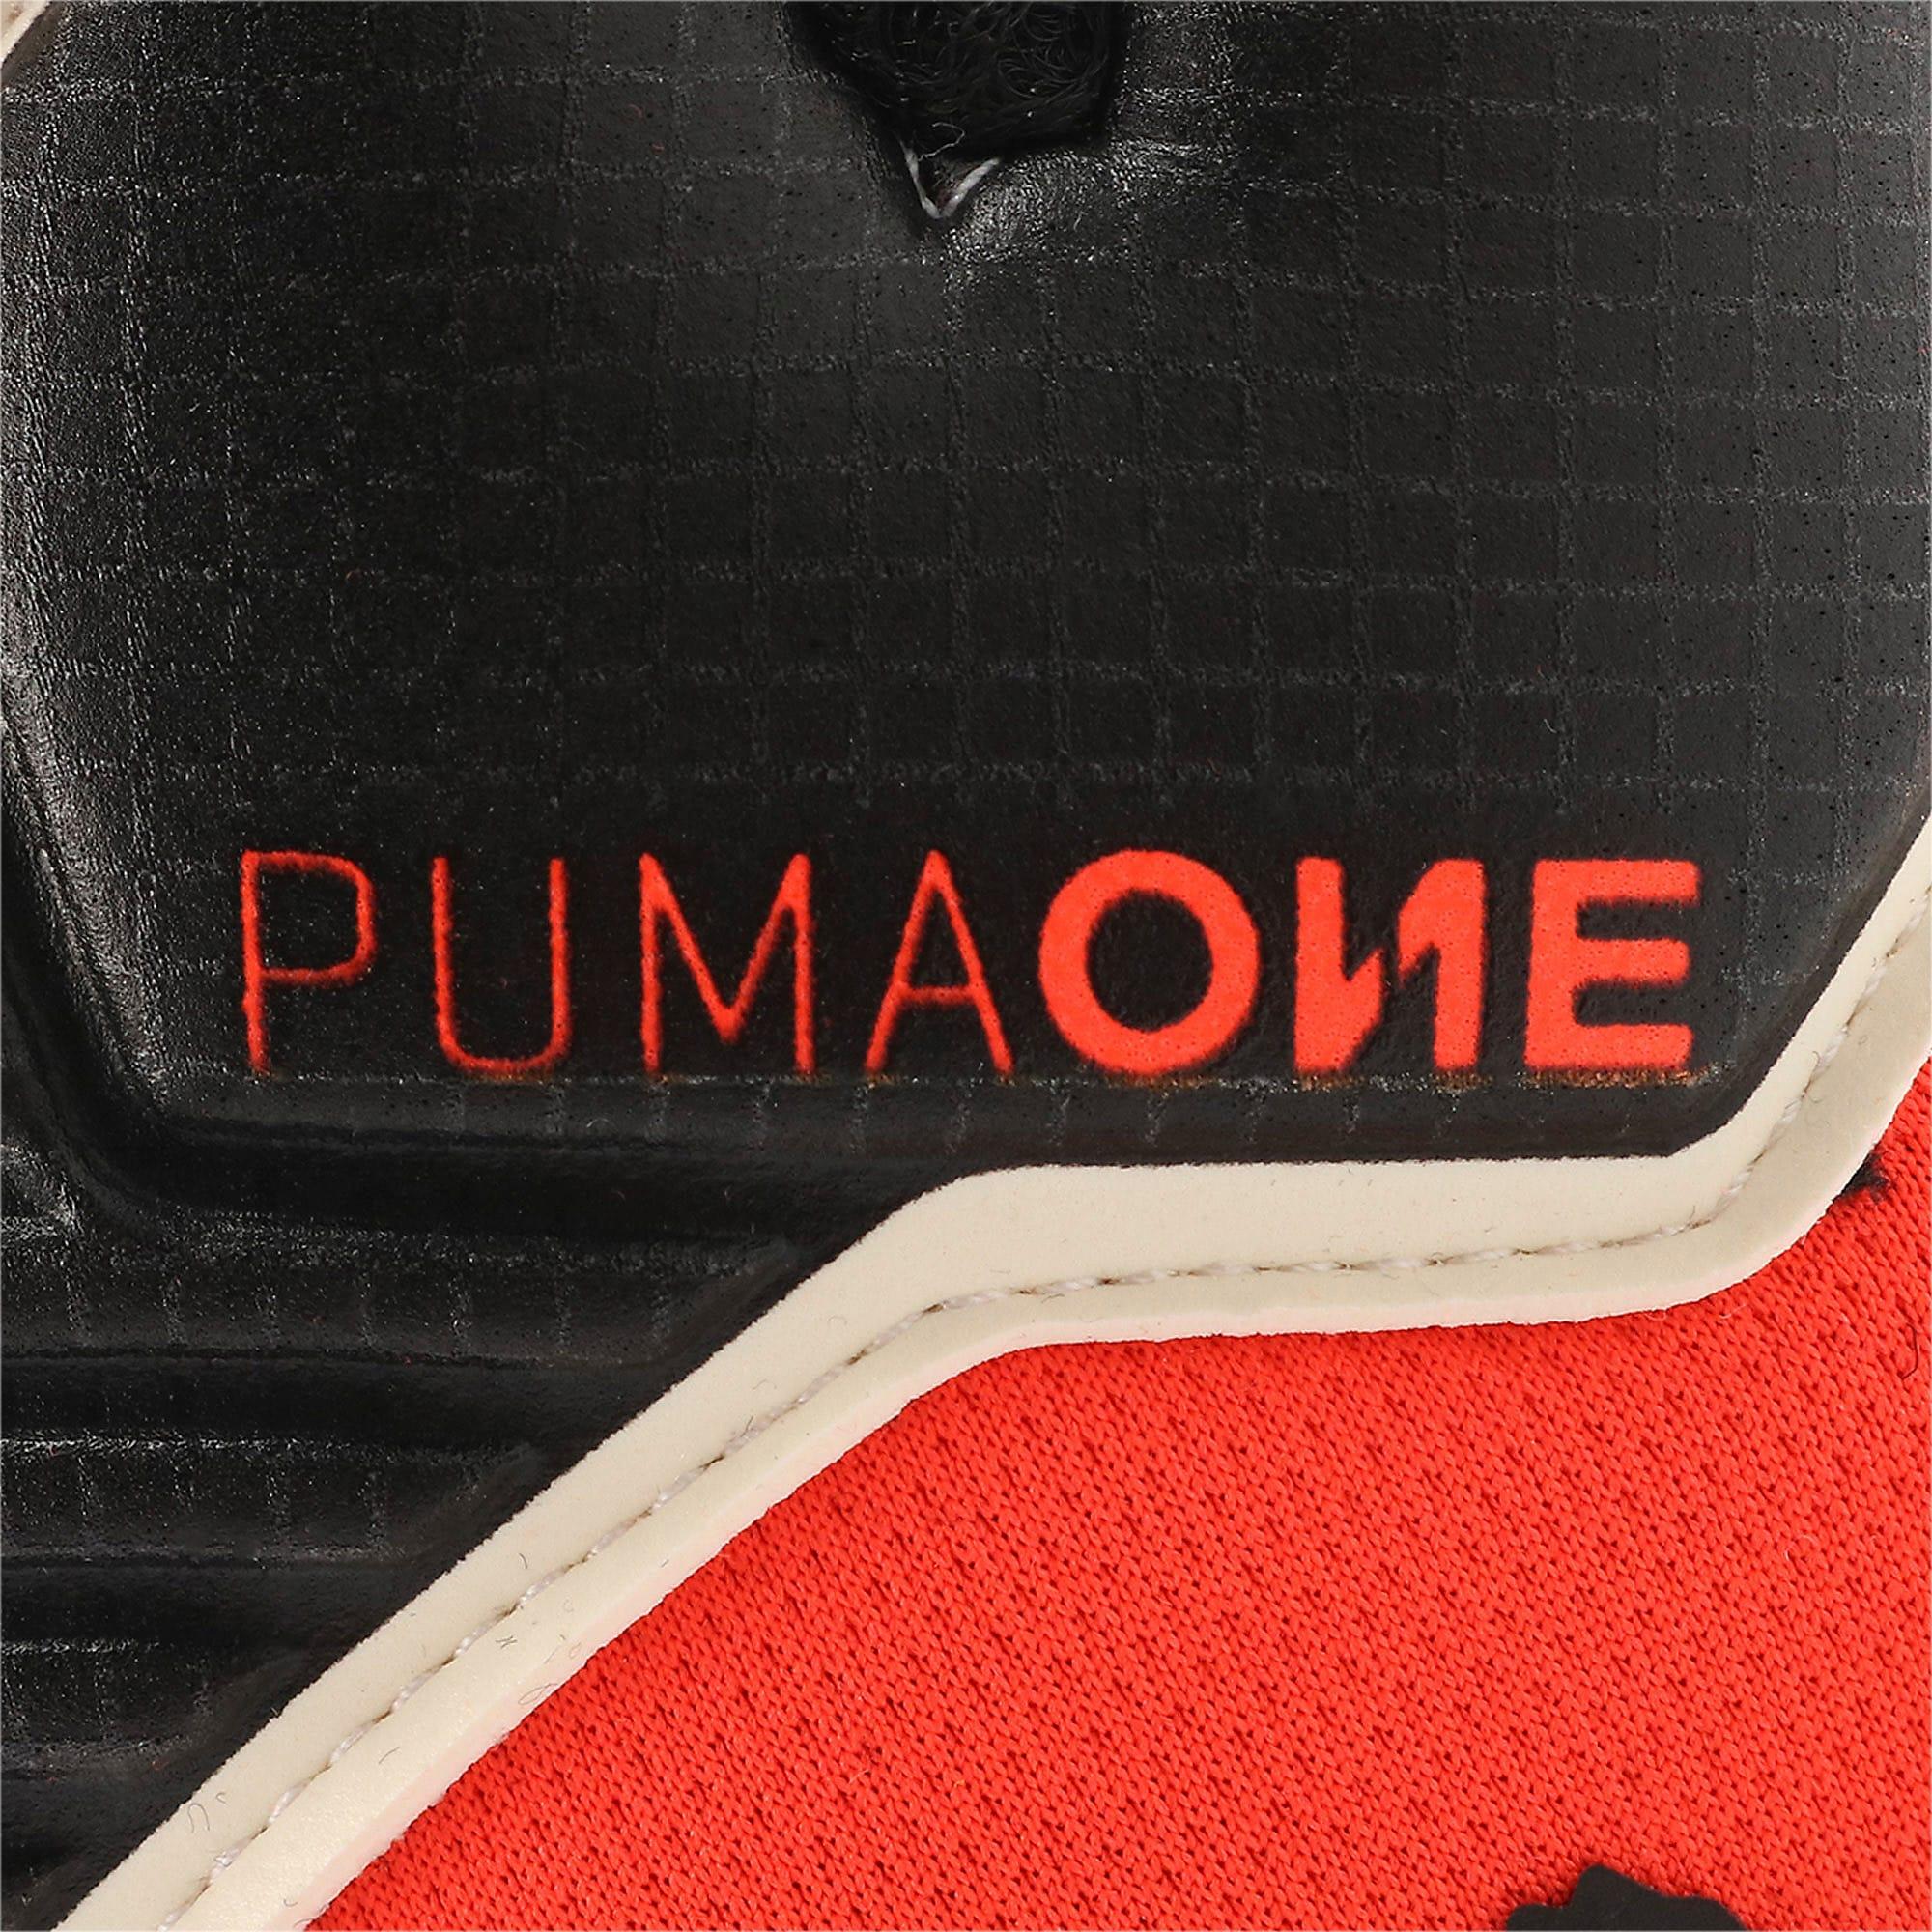 Thumbnail 7 of プーマ ワン グリップ 1 RC サッカー ゴールキーパーグローブ, Nrgy Red-Black-Puma White, medium-JPN